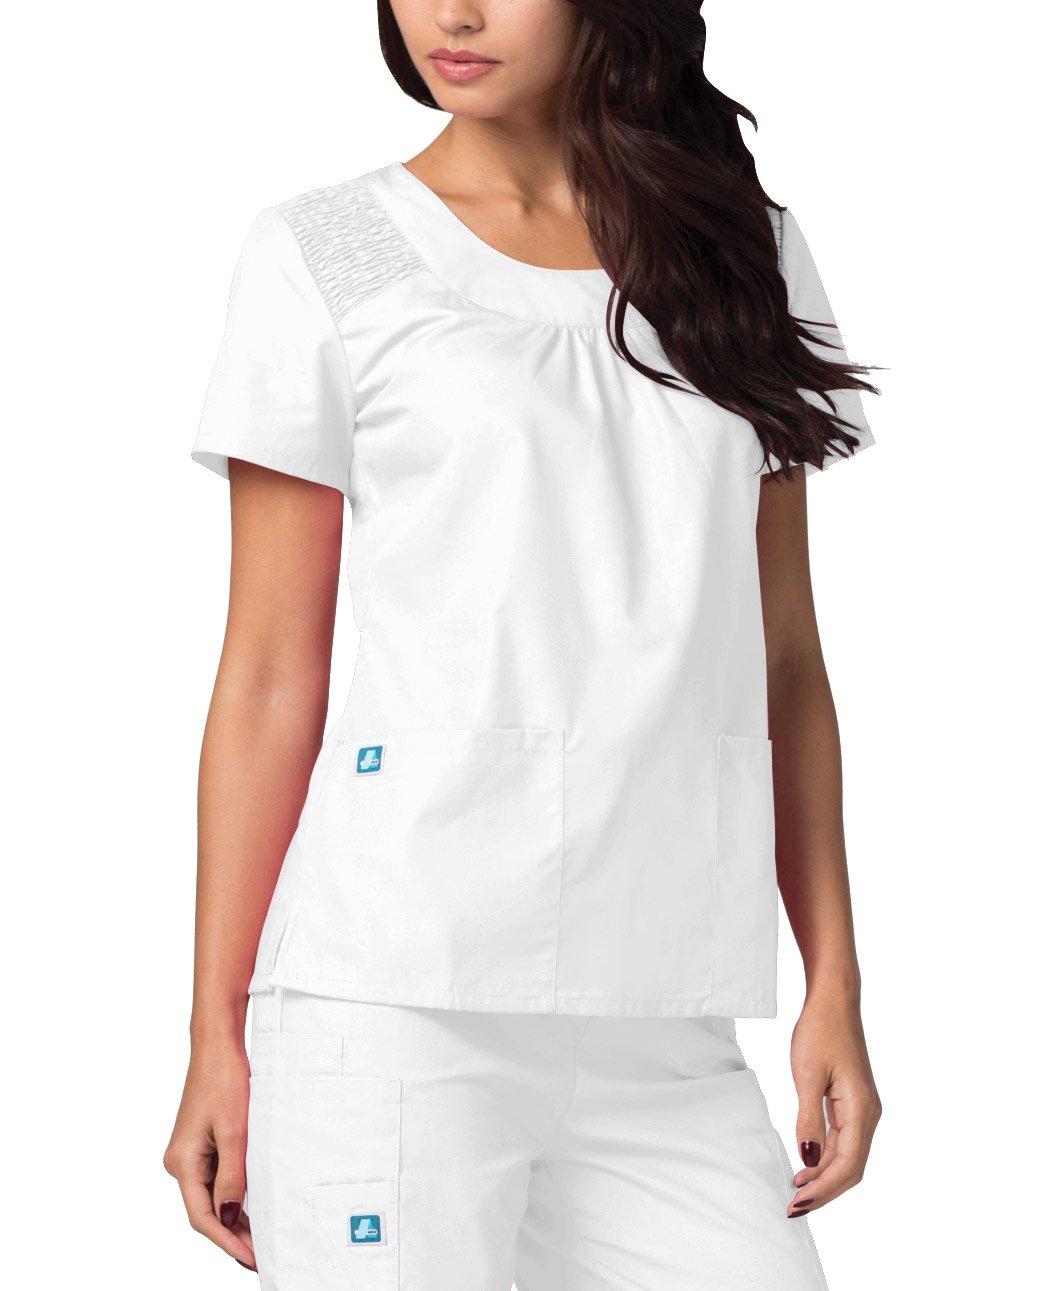 ADAR UNIFORMS Adar Medical Women's Scoop Neck Smocked Solid Top - 627 - White - 2X